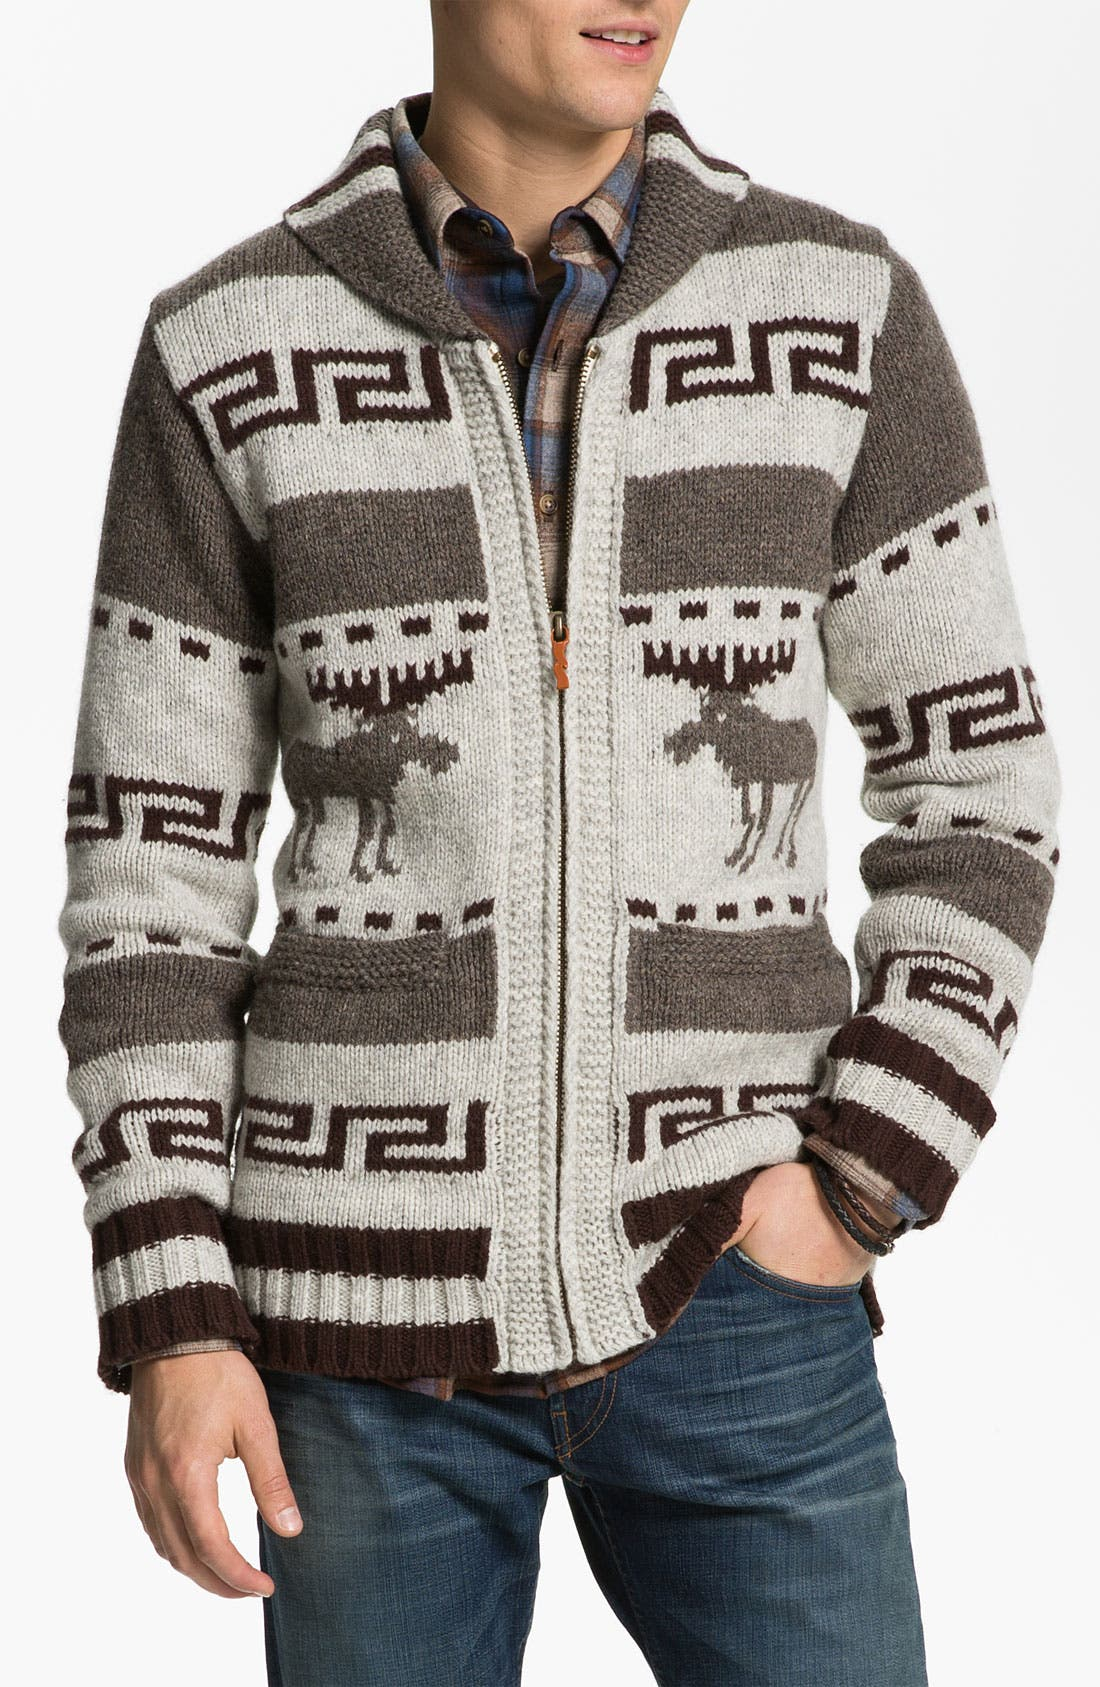 NUDIE JEANS, Nudie 'Lenny Elk' Shawl Collar Zip Sweater, Main thumbnail 1, color, 020